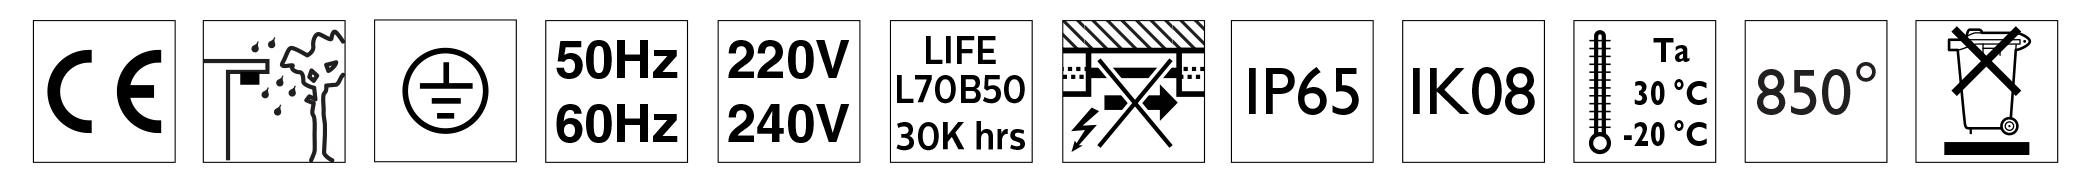 LEDINAIRE WT060C.indd